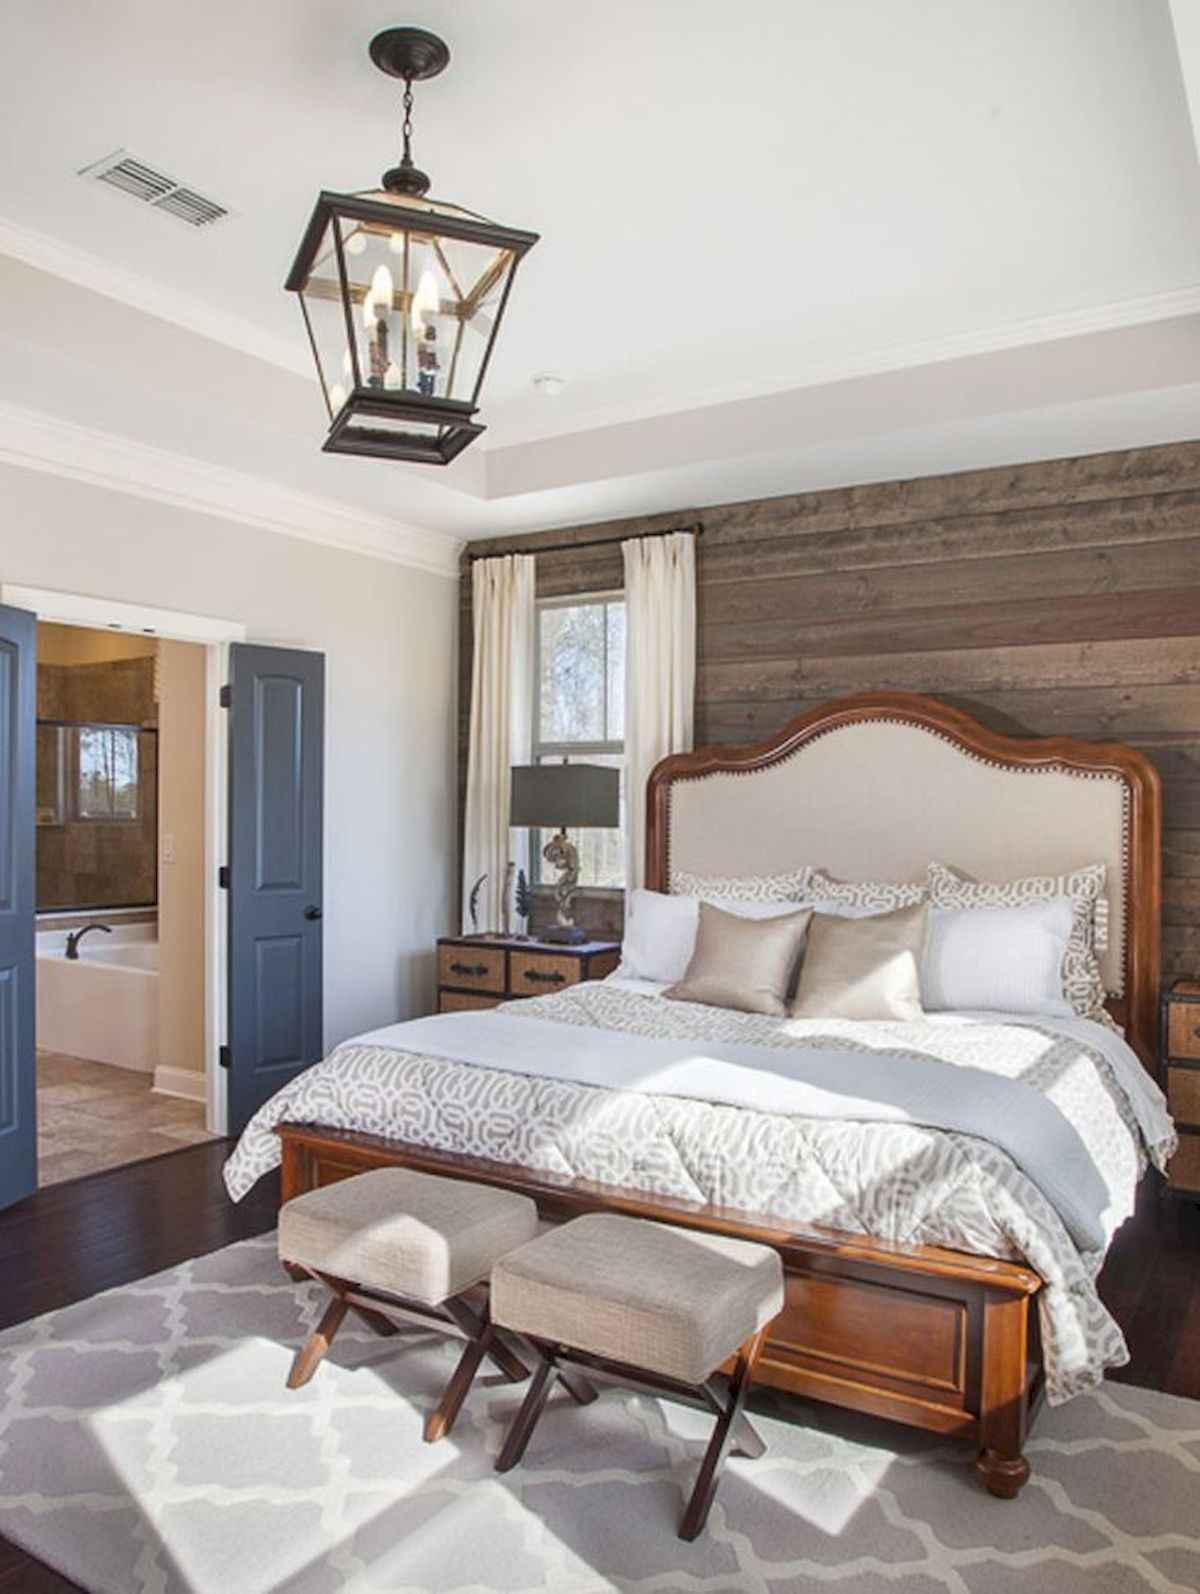 40 Lighting For Farmhouse Bedroom Decor Ideas And Design